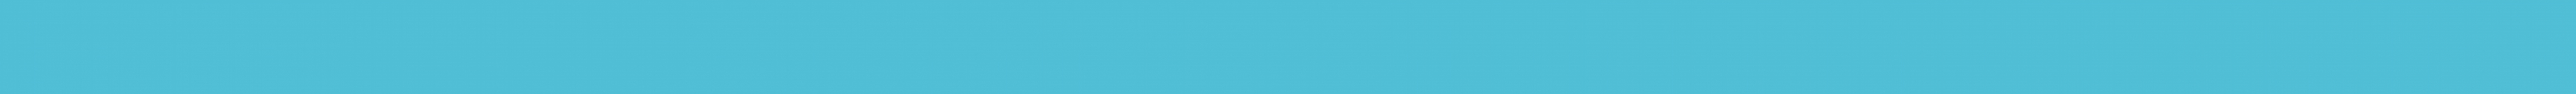 Glass border turquoise 2*60